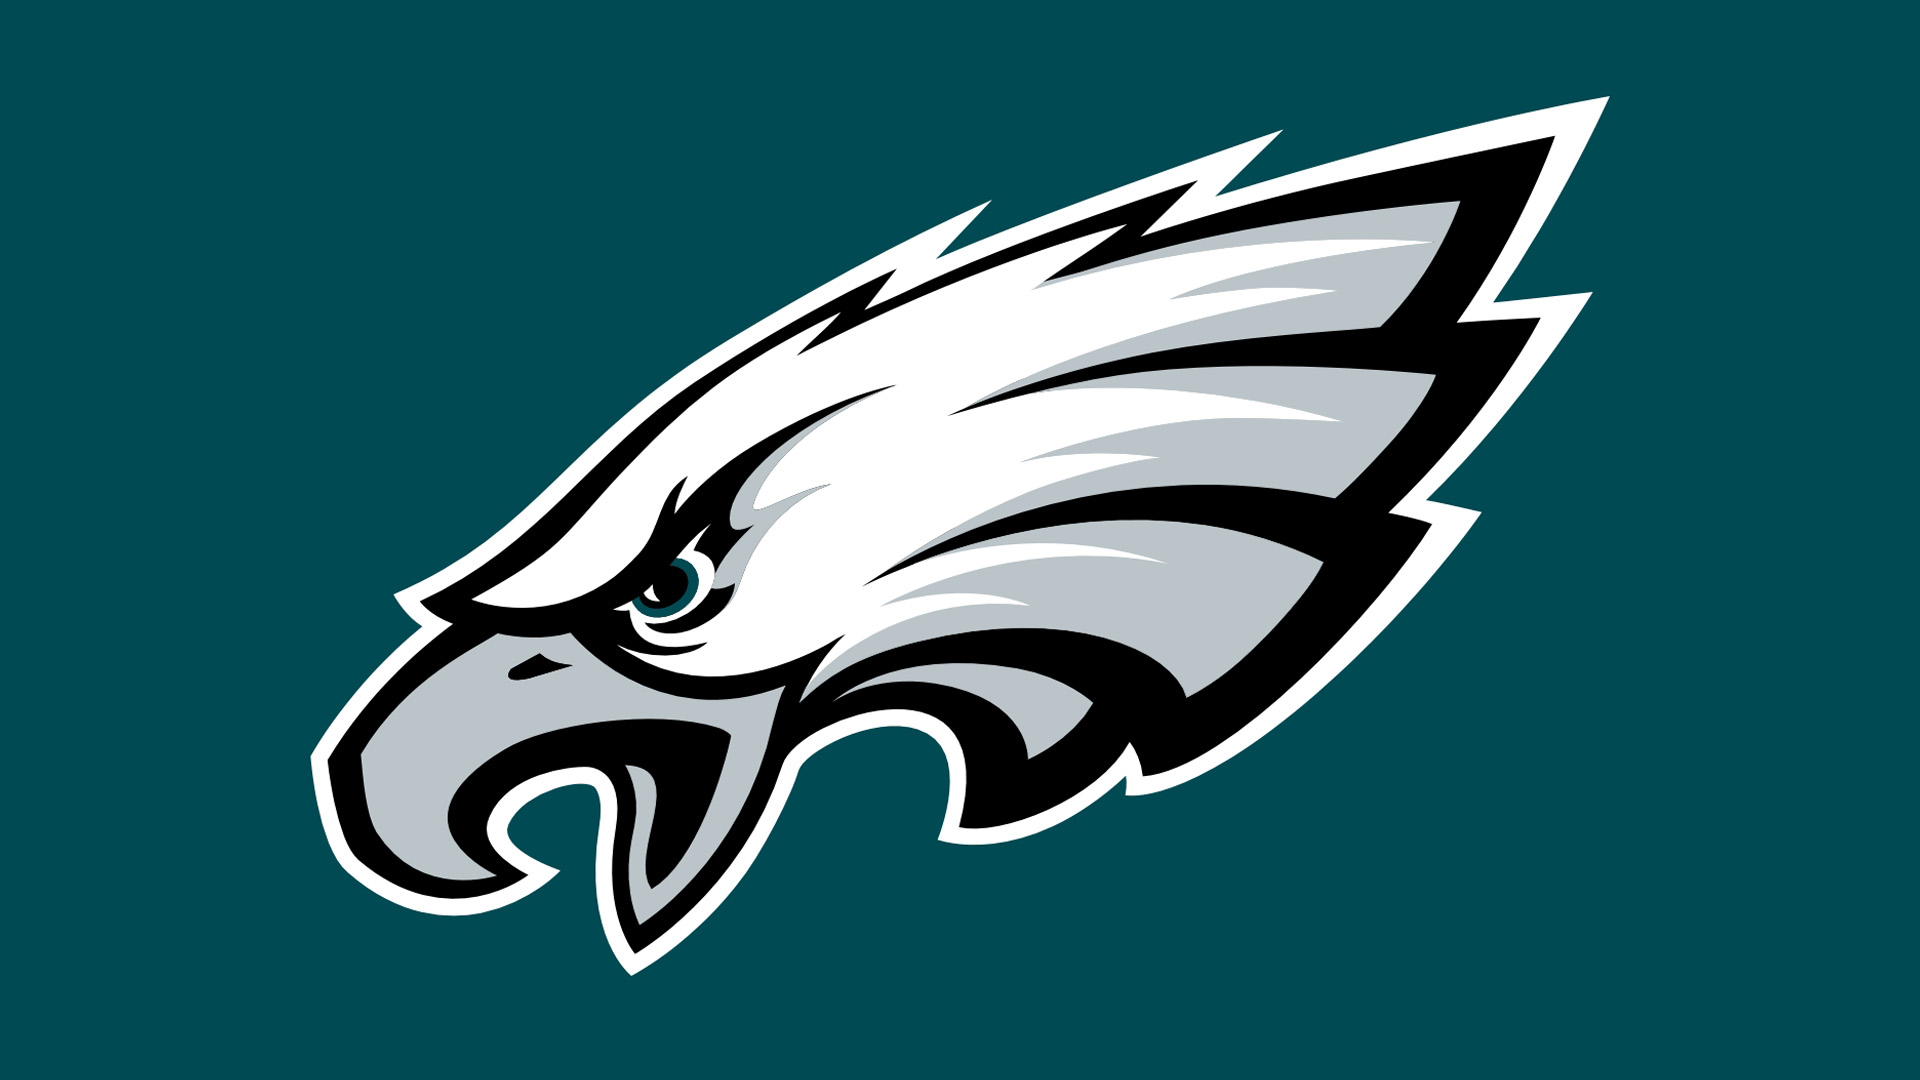 Nfl Philadelphia Eagles Logos